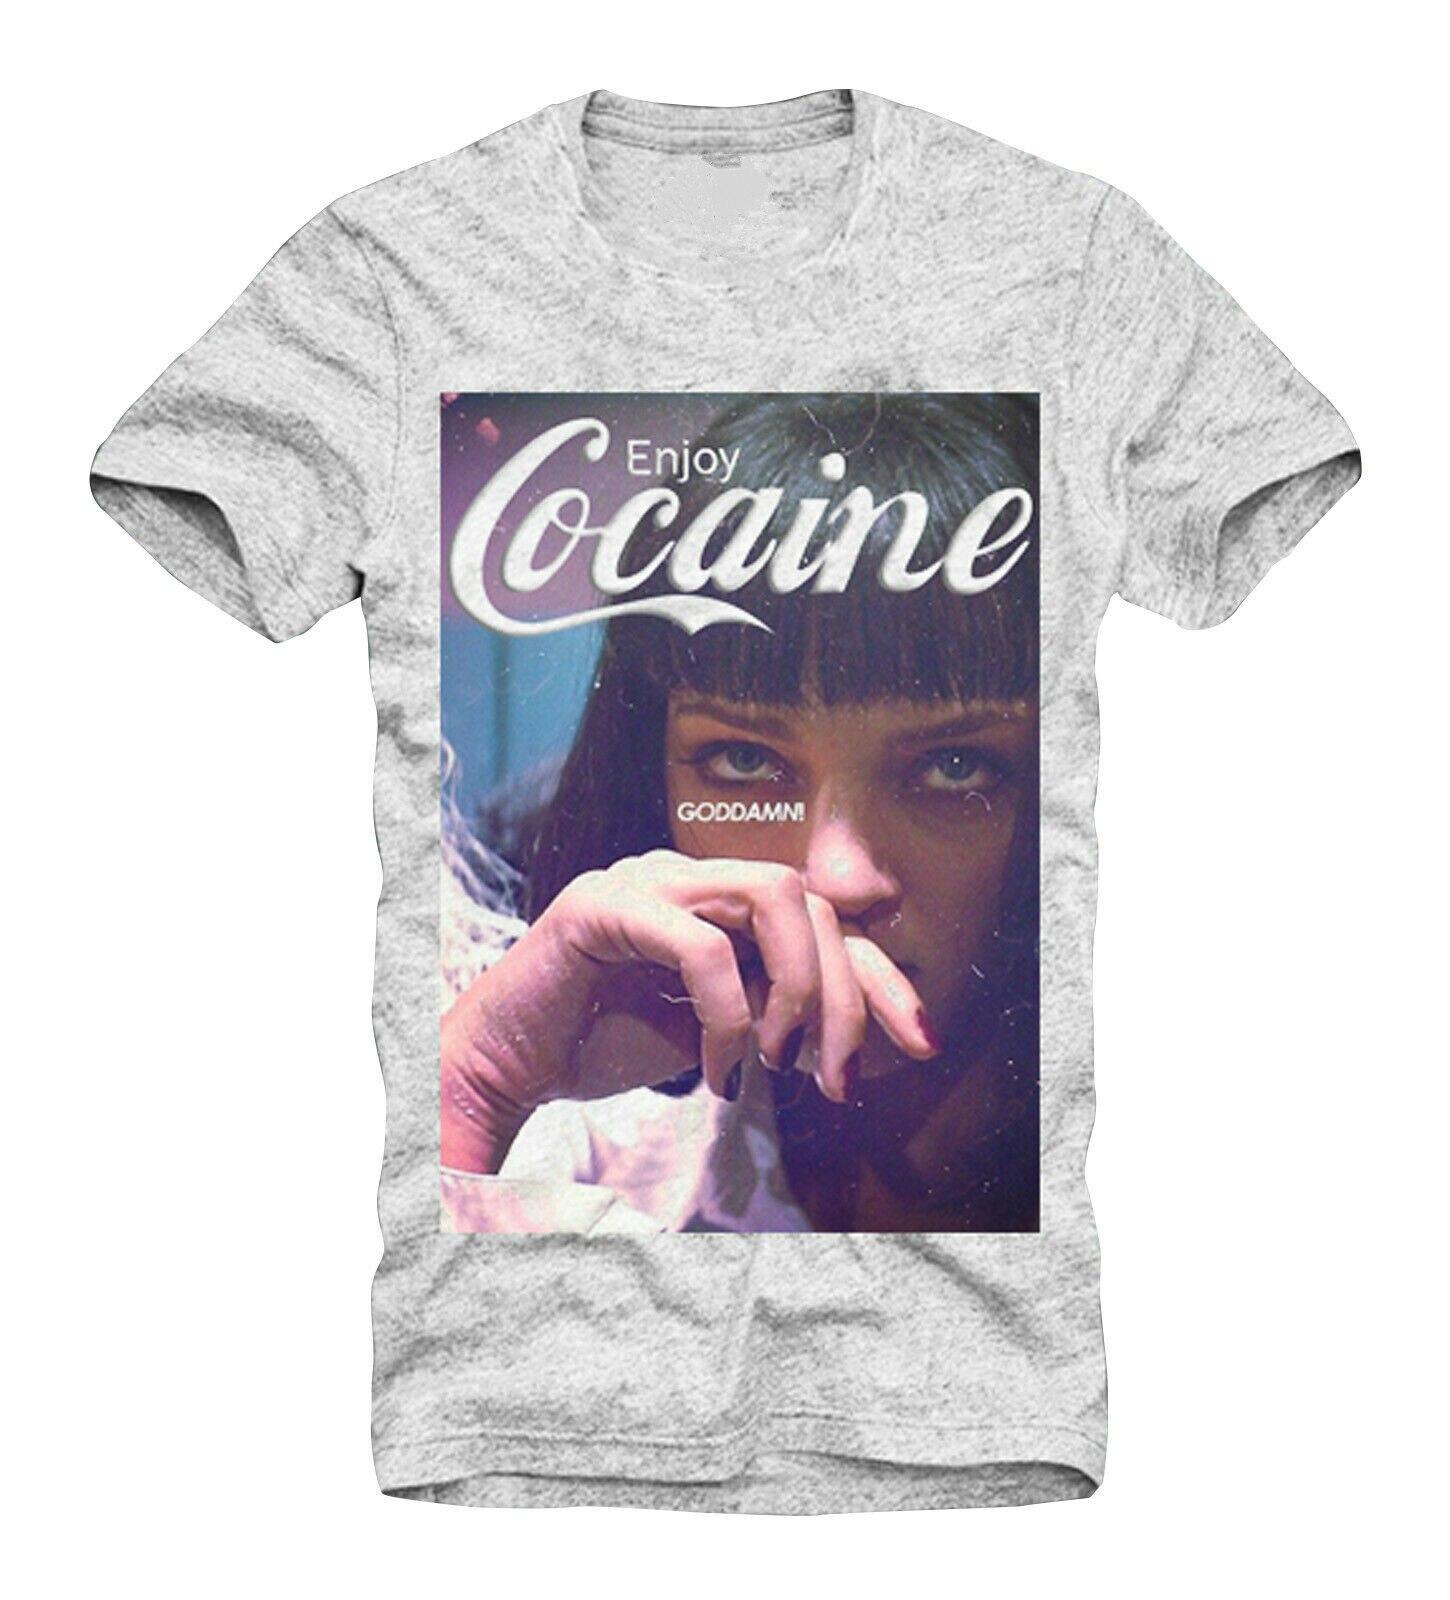 E1Syndicate T camisa Kokain Mdma velocidad ketamina fiesta Rave Lsd, 3500G tamaño Unisex S-3Xl